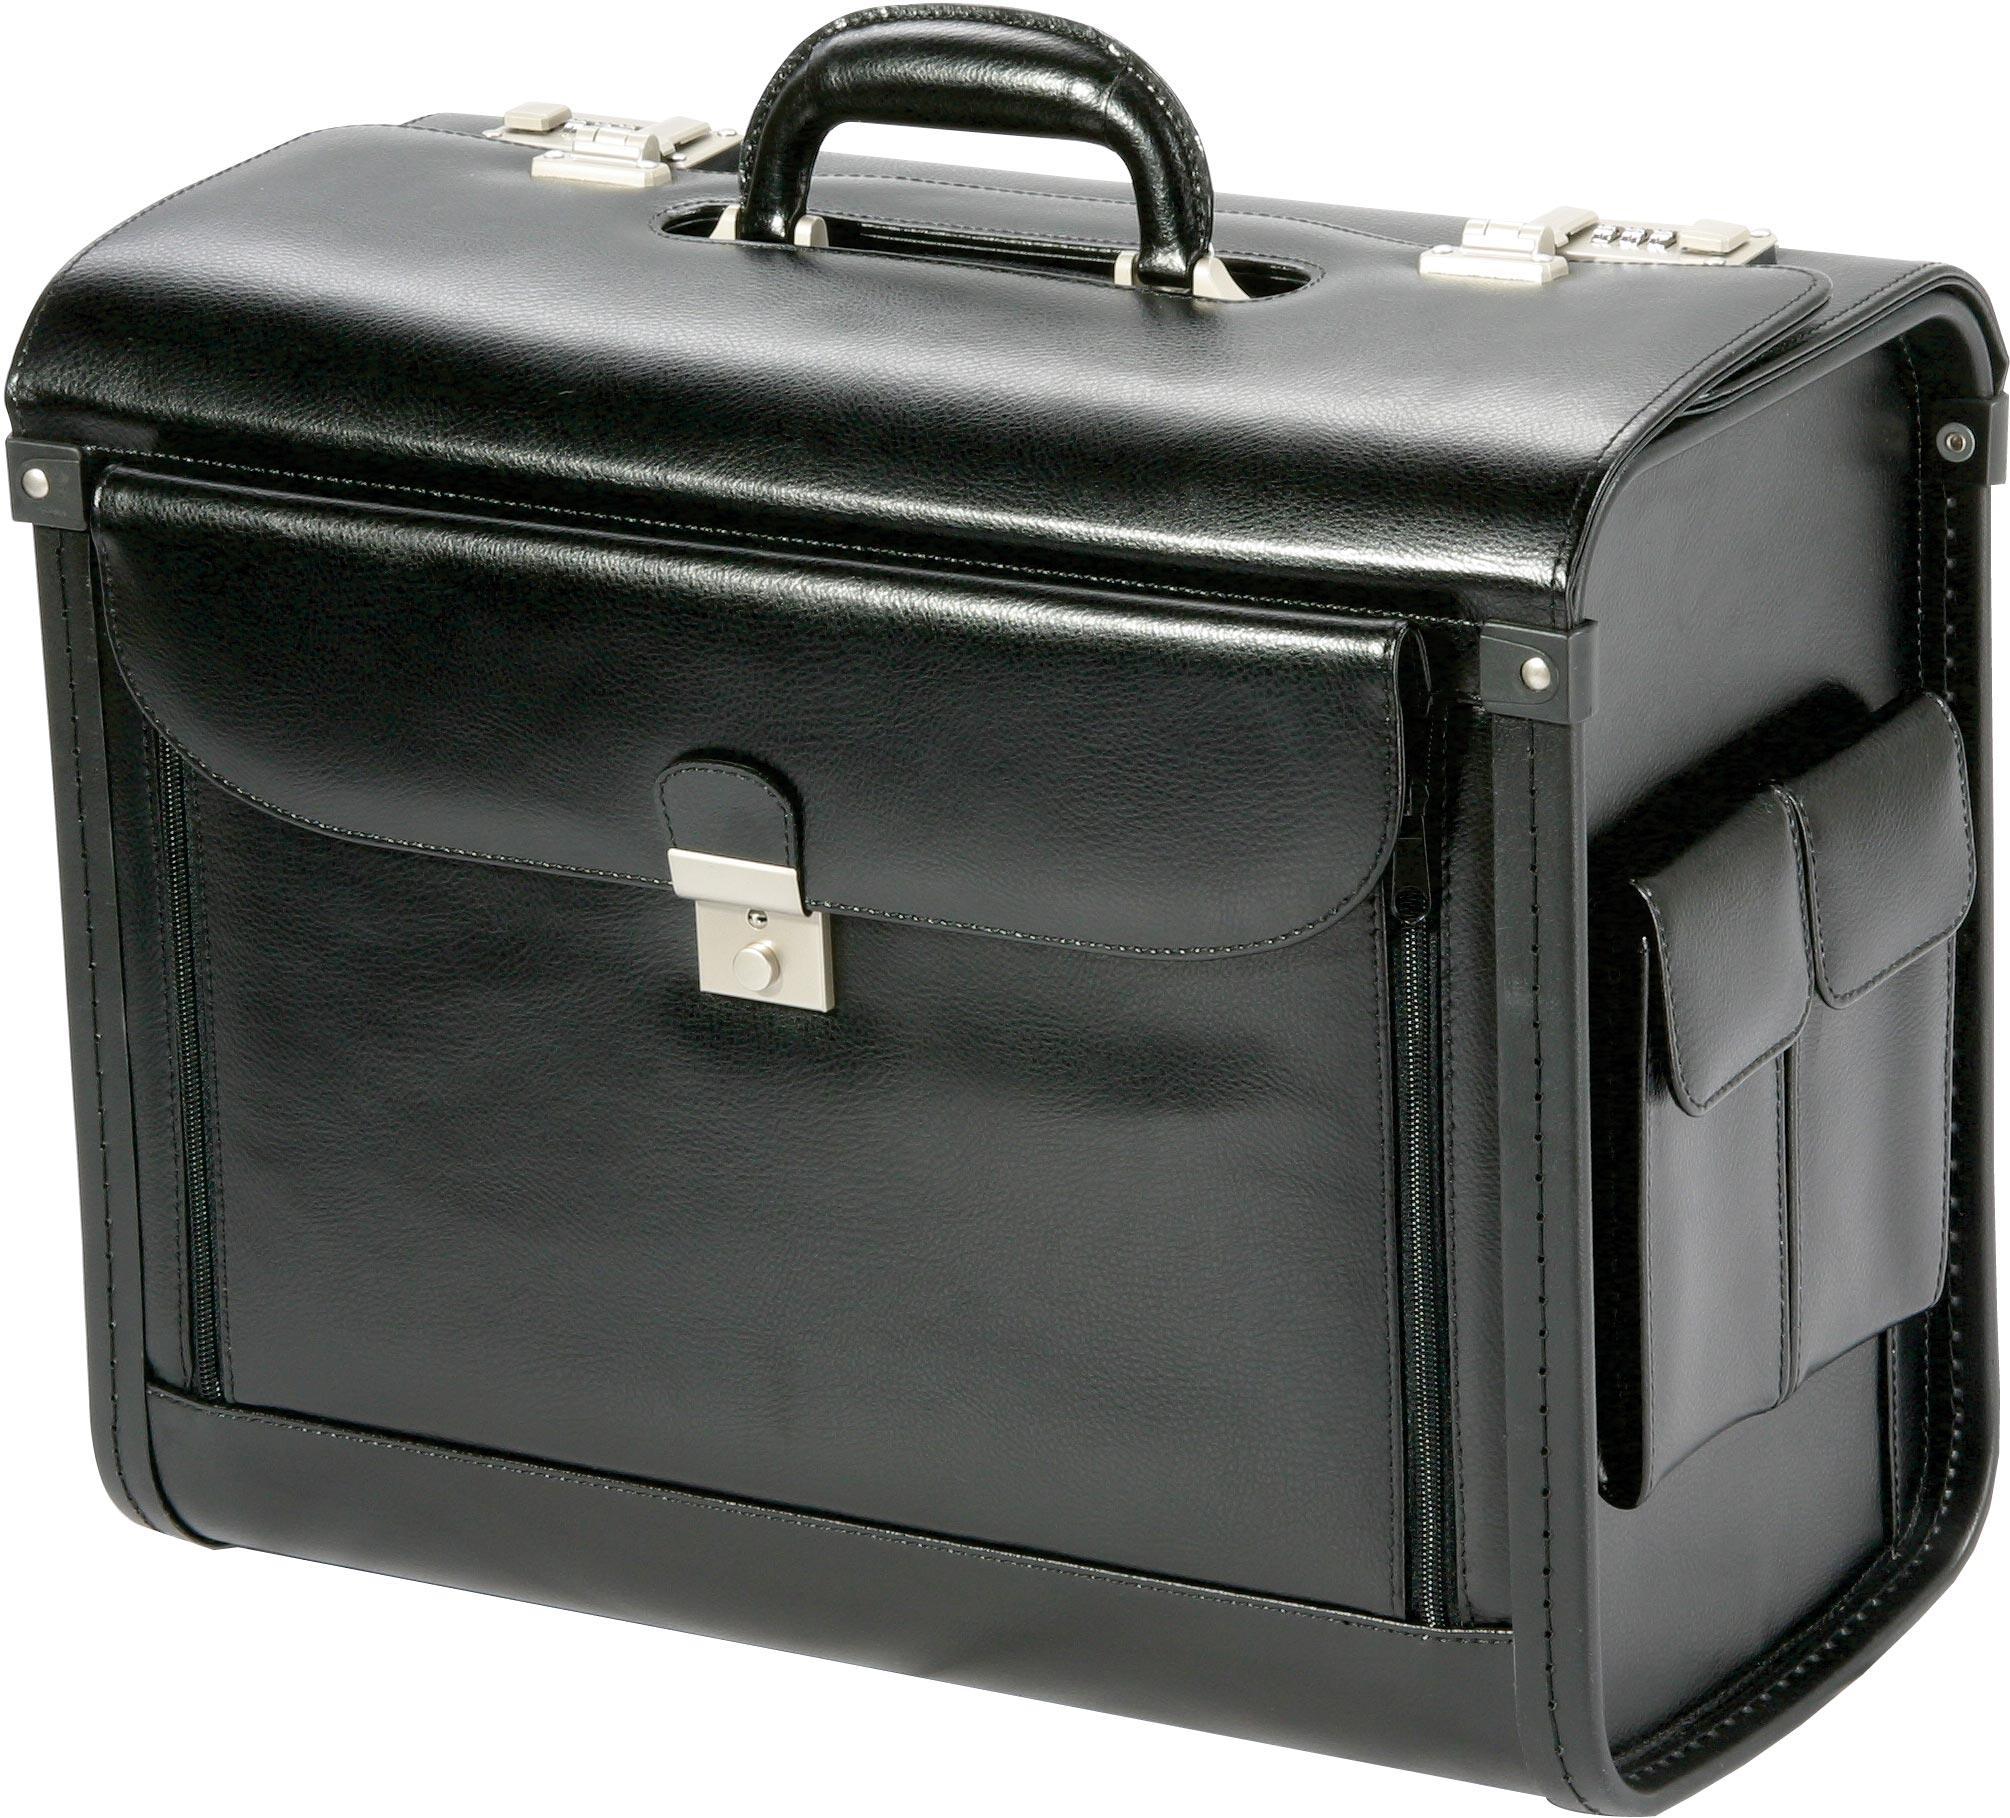 valise de pilote en cuir profil noir meandmy 28000 bagage d 39 affaires citasac. Black Bedroom Furniture Sets. Home Design Ideas